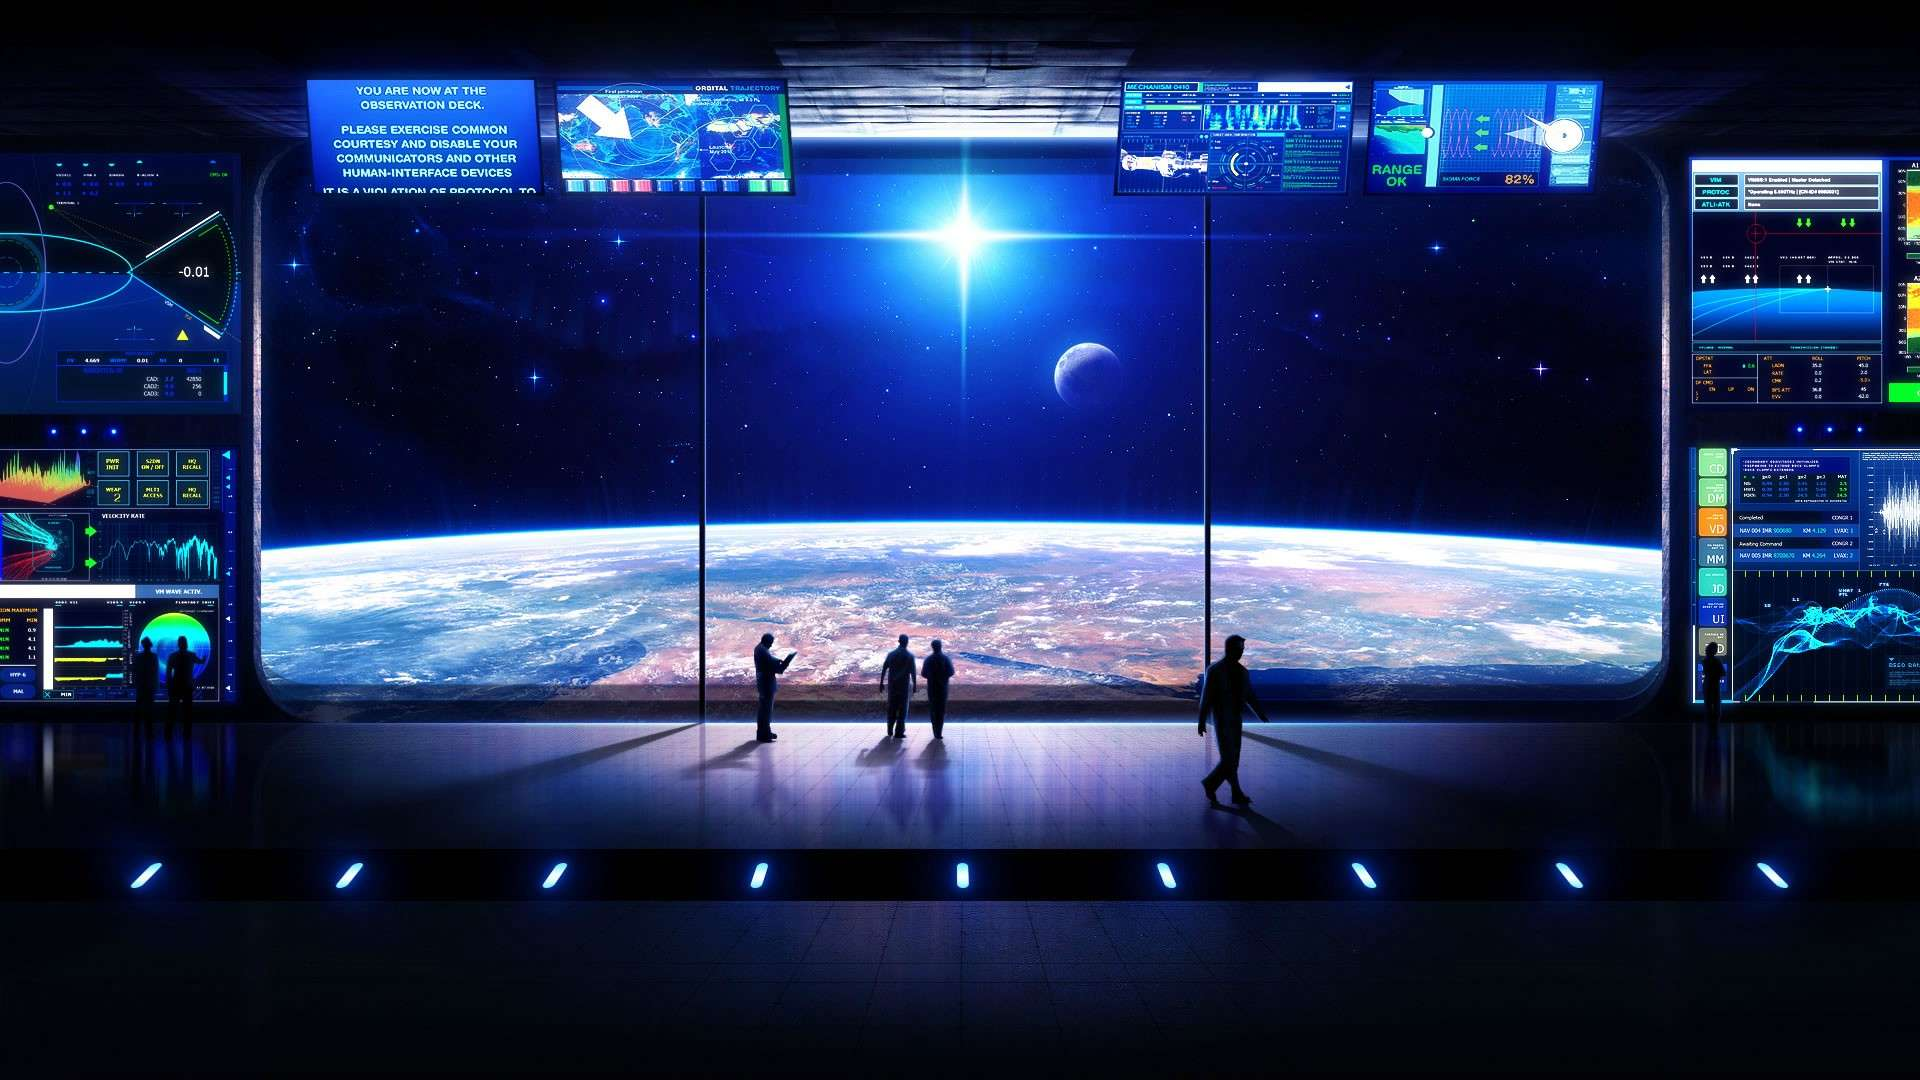 Space 3D Wallpaper Full PC